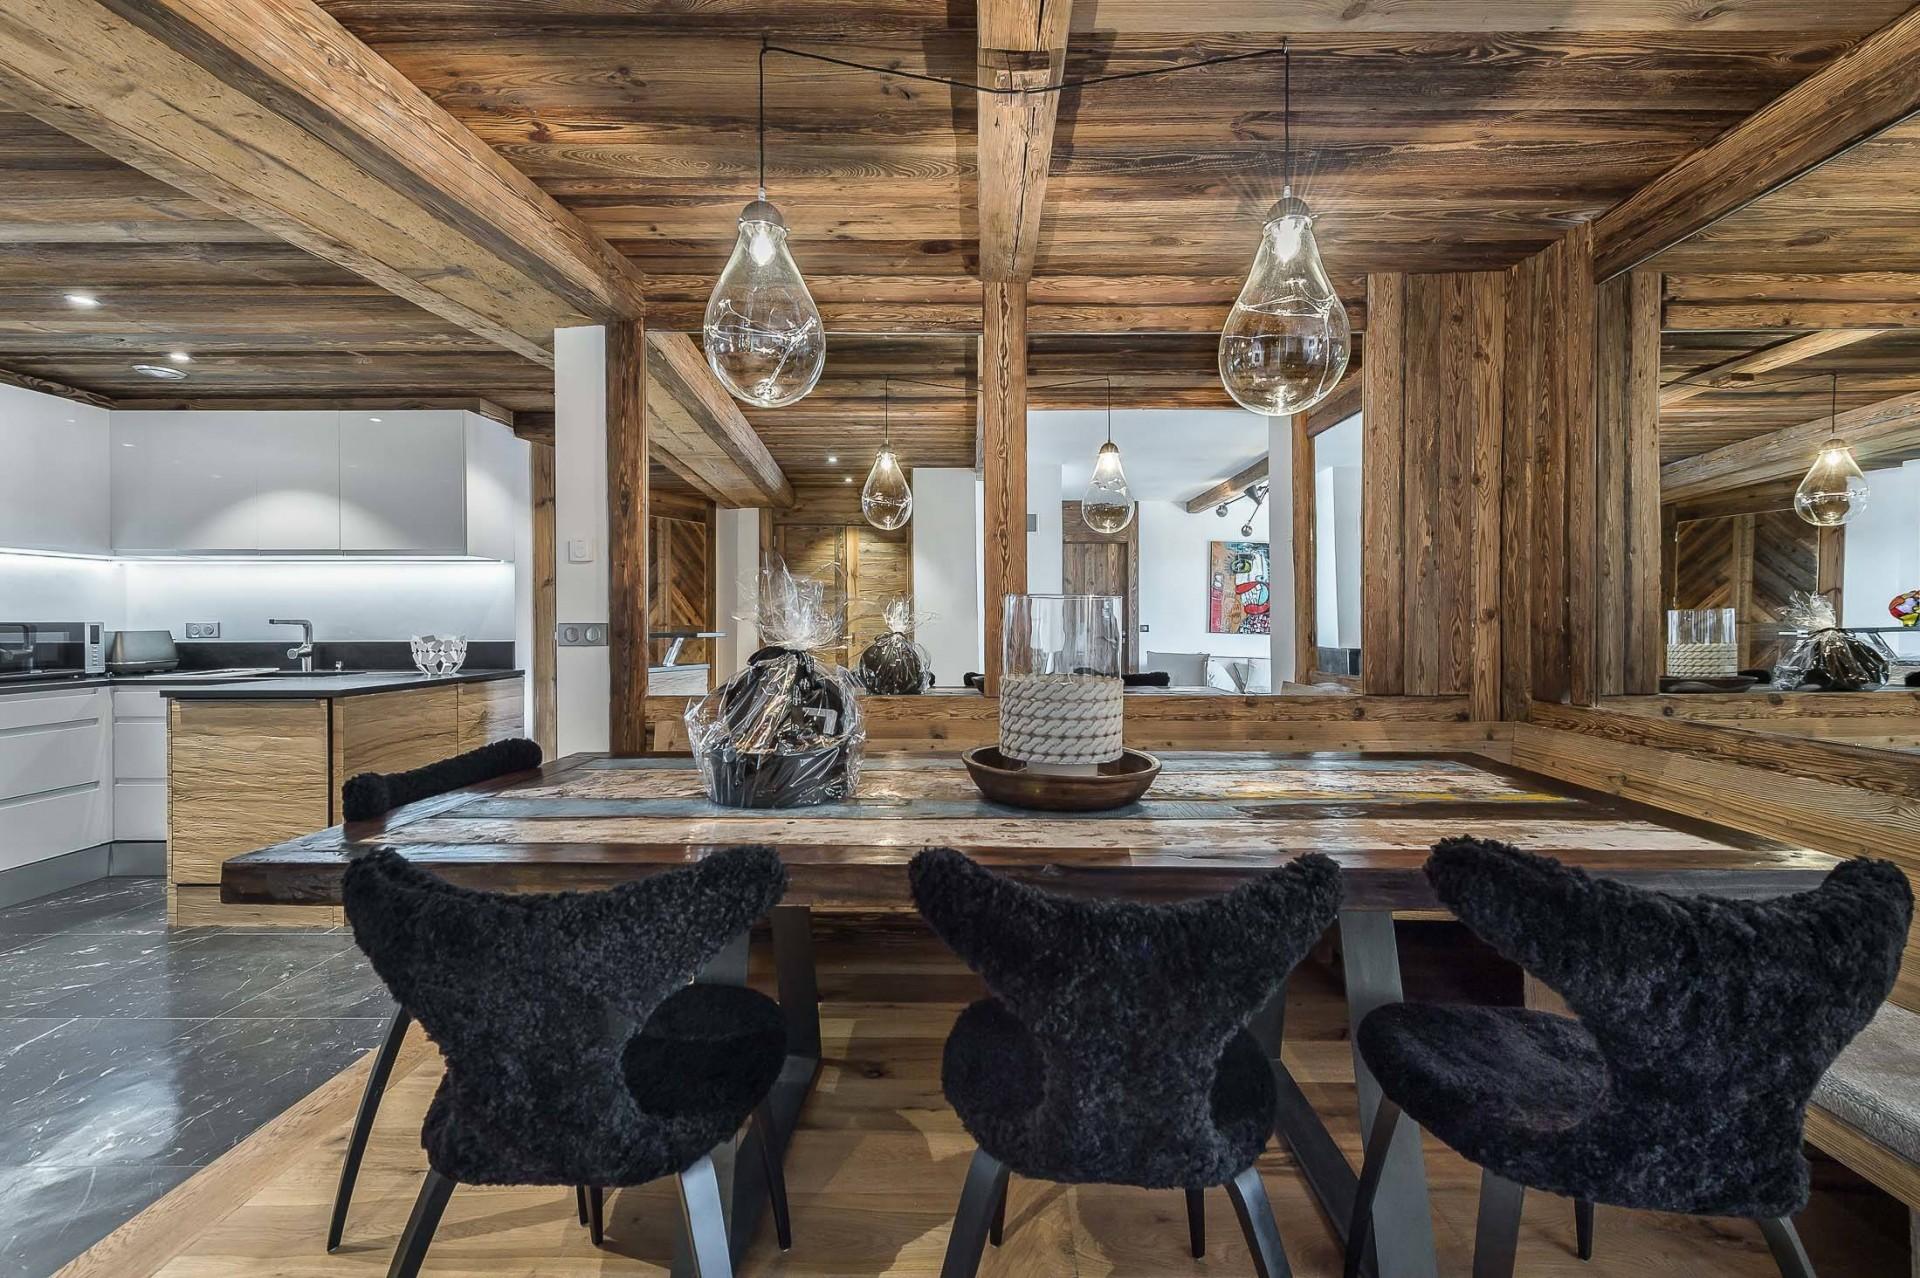 Val d'Isère Location Appartement Luxe Ucelite Salle A Manger